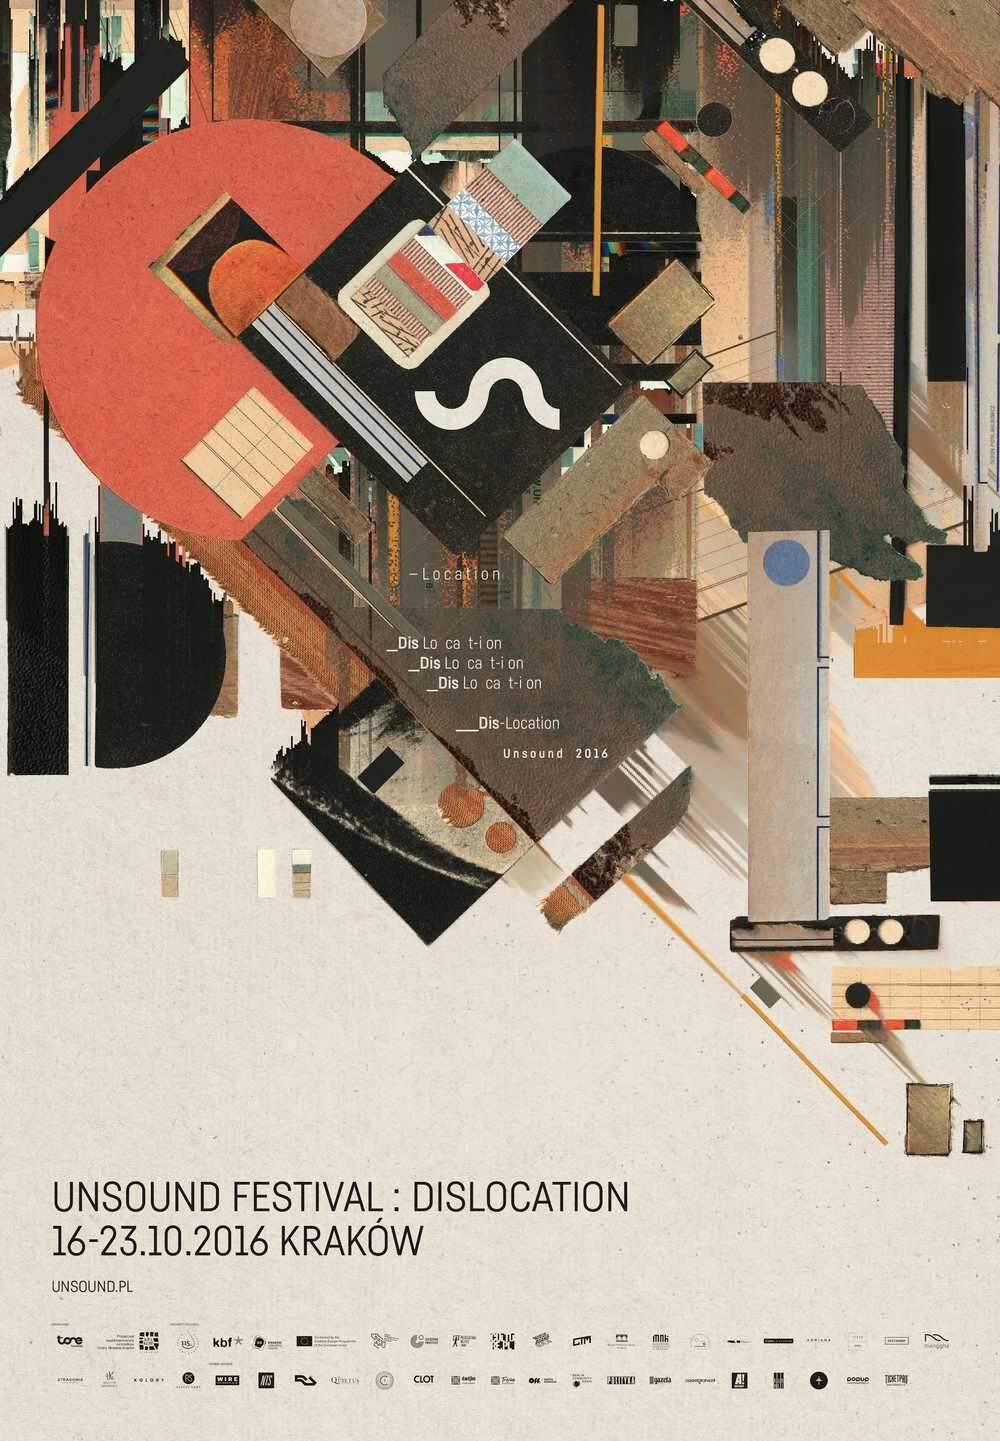 Unsound Kraków 2016: Dislocation poster